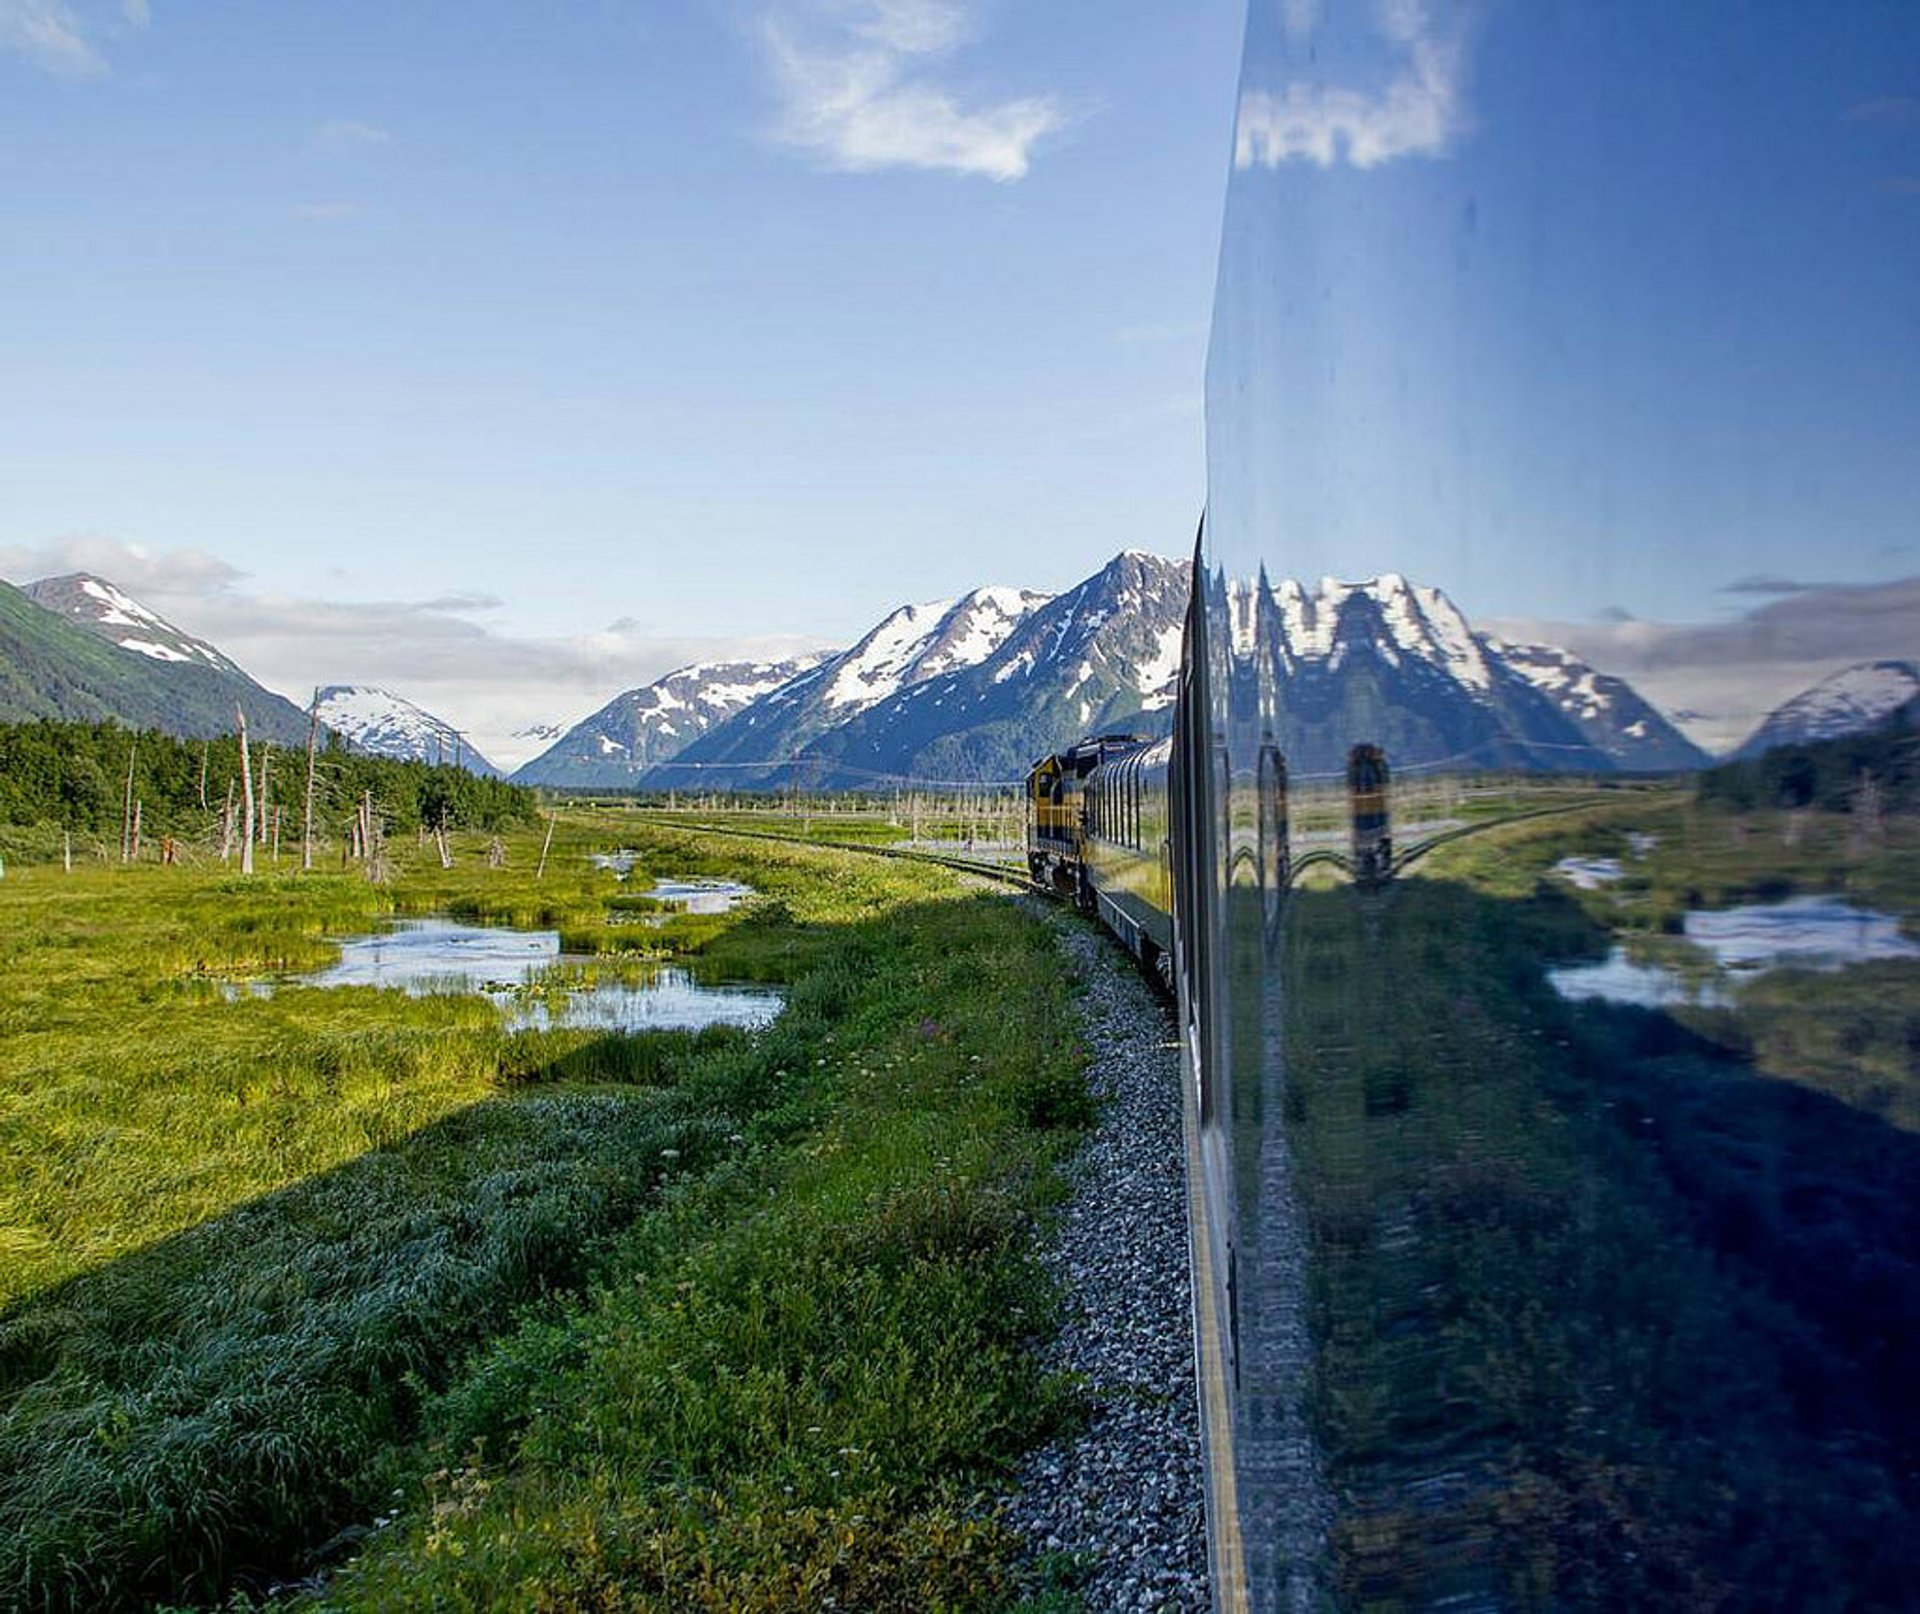 Alaska railway just outside Anchorage 2020